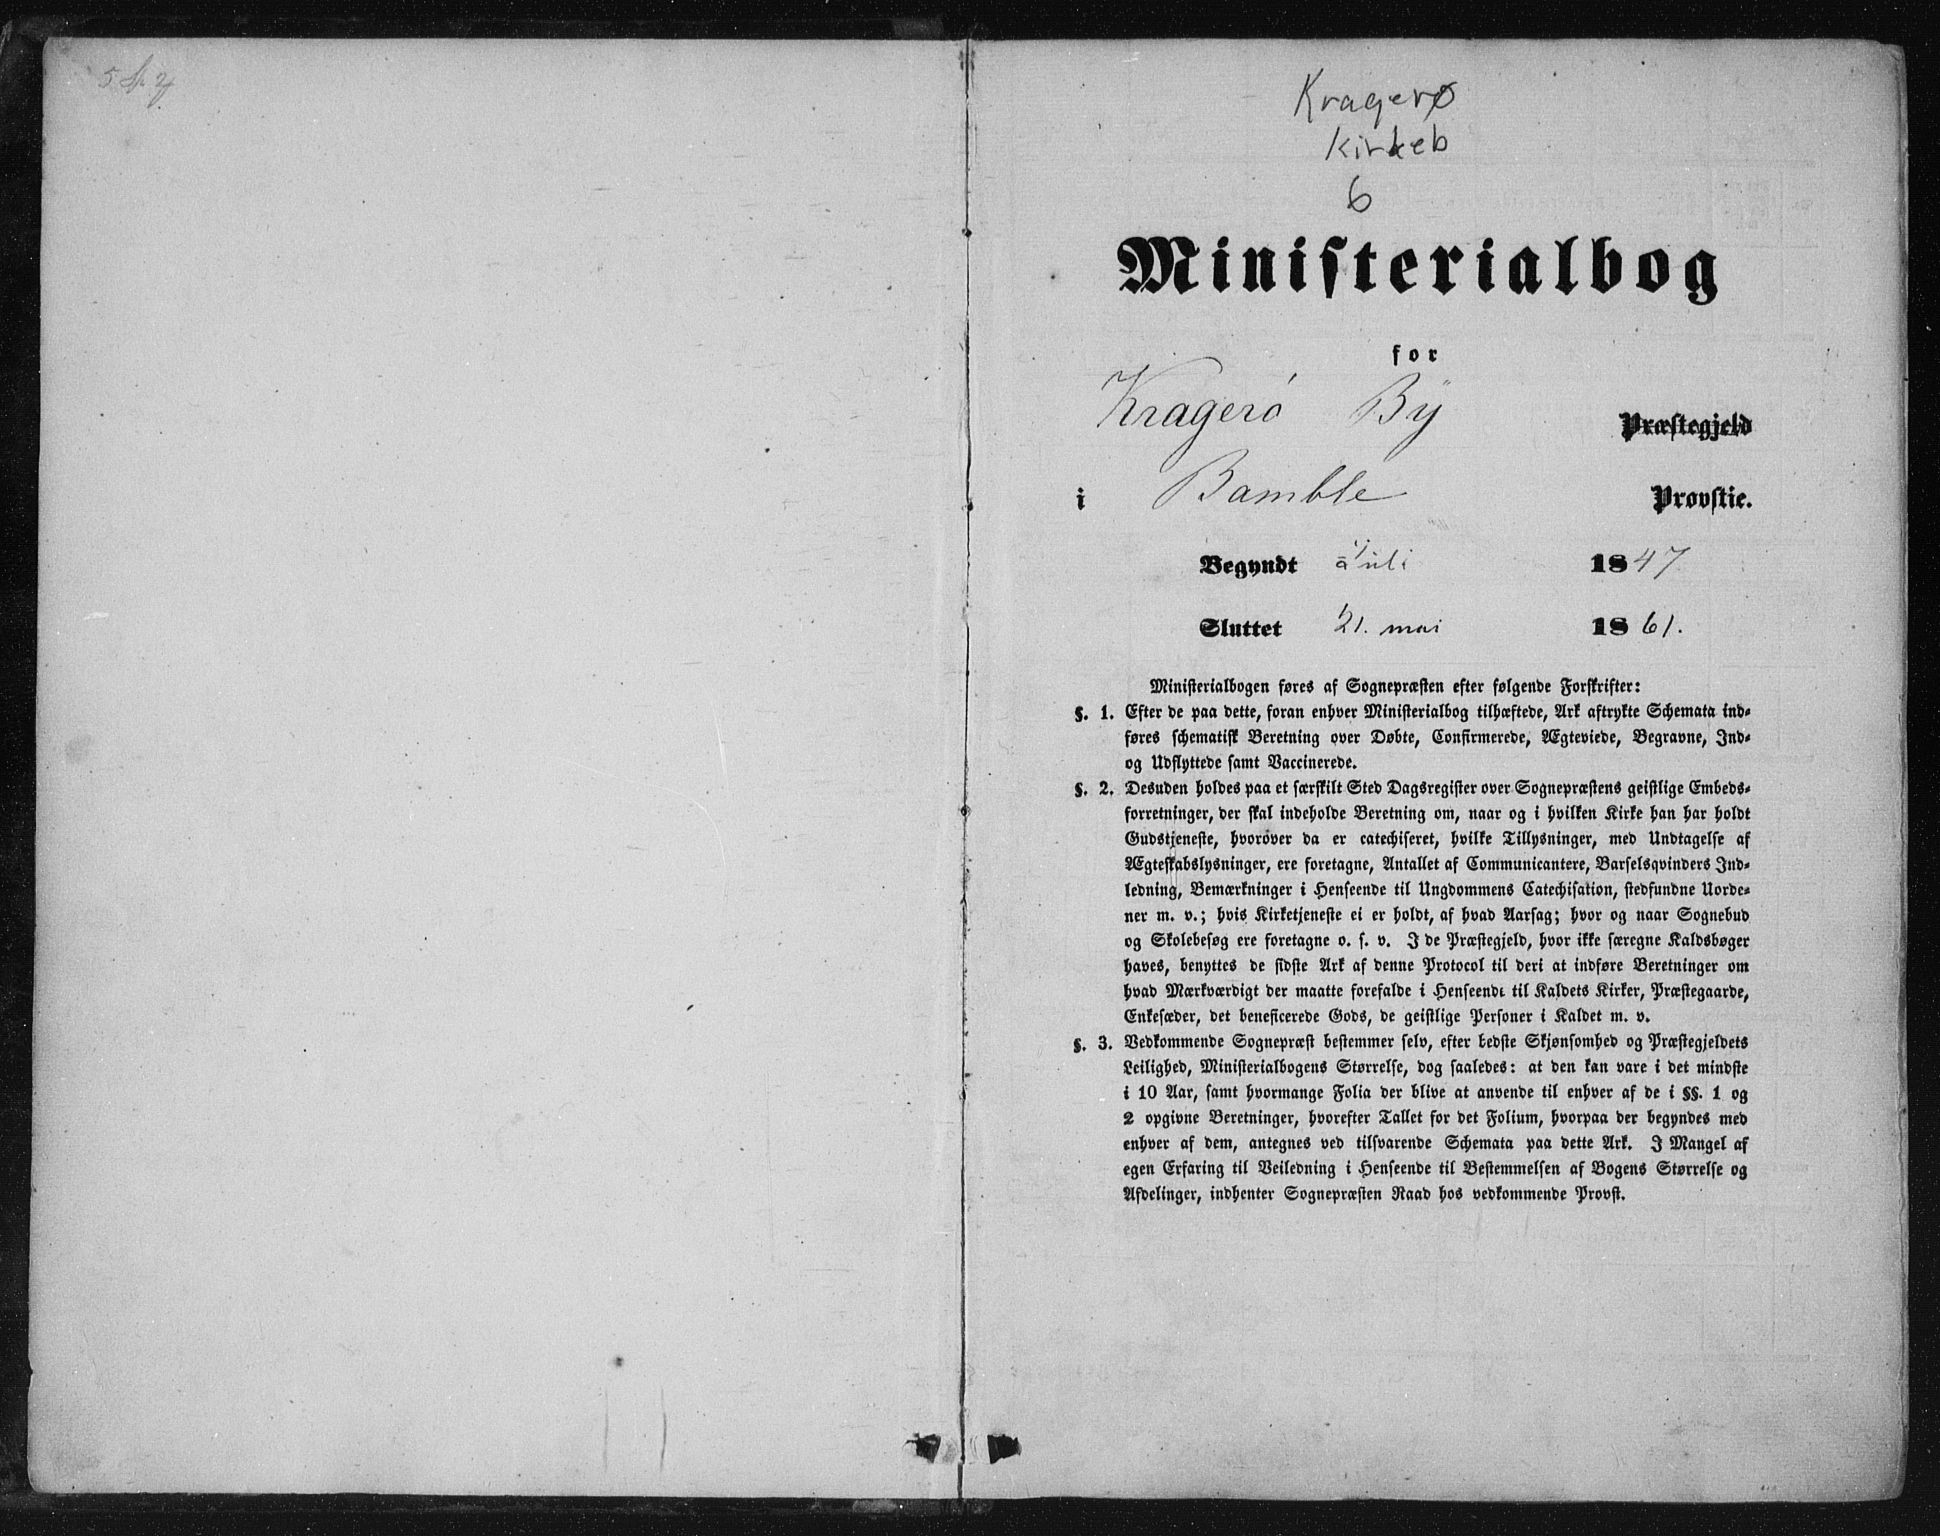 SAKO, Kragerø kirkebøker, F/Fa/L0006: Ministerialbok nr. 6, 1847-1861